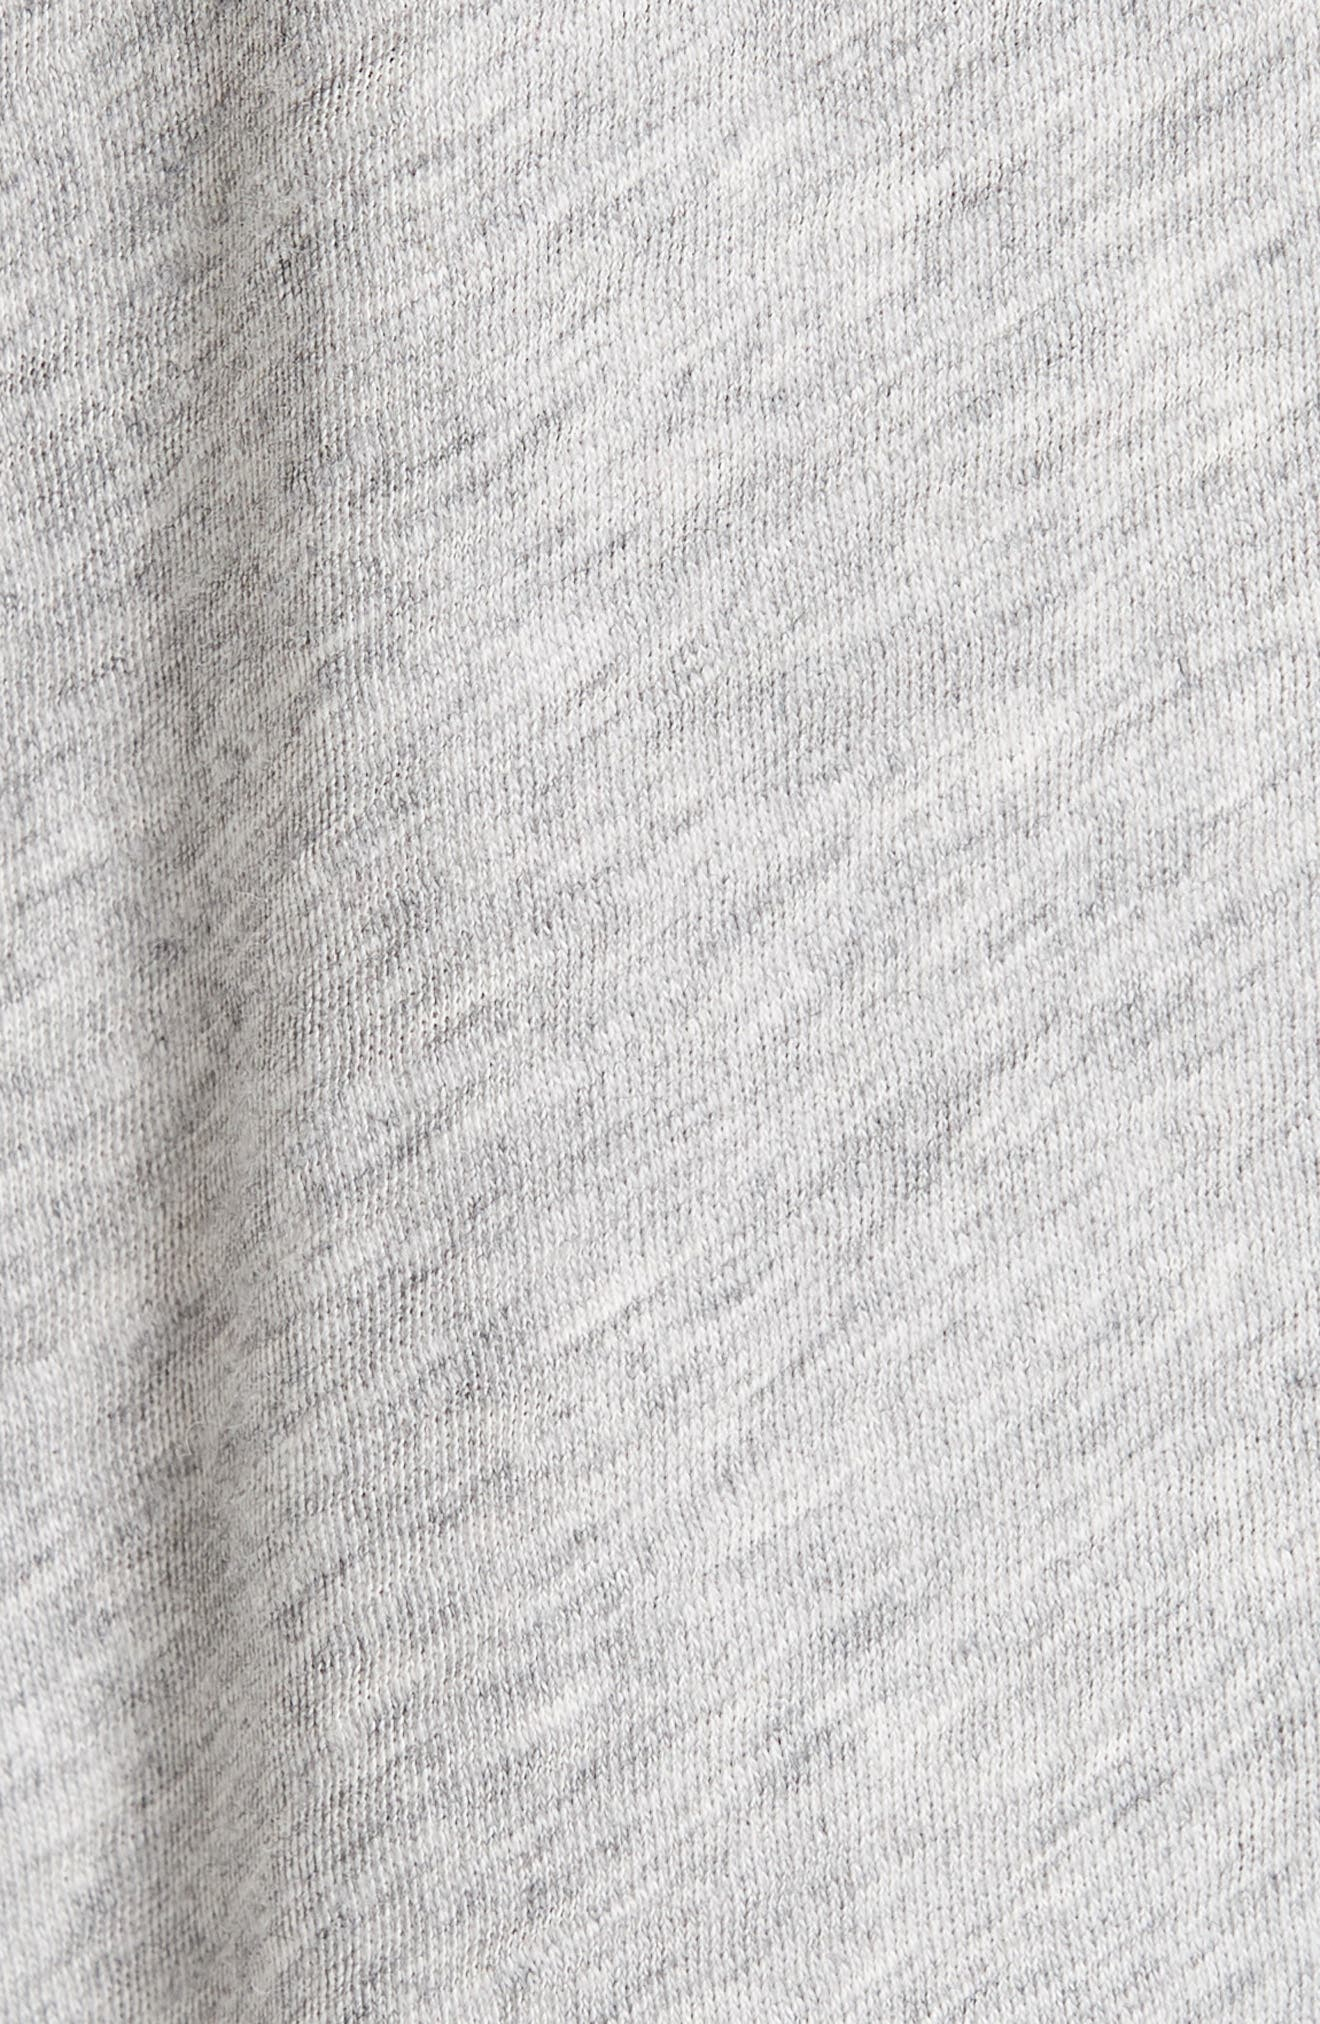 RAG & BONE,                             Bye Embroidered Tee,                             Alternate thumbnail 5, color,                             023